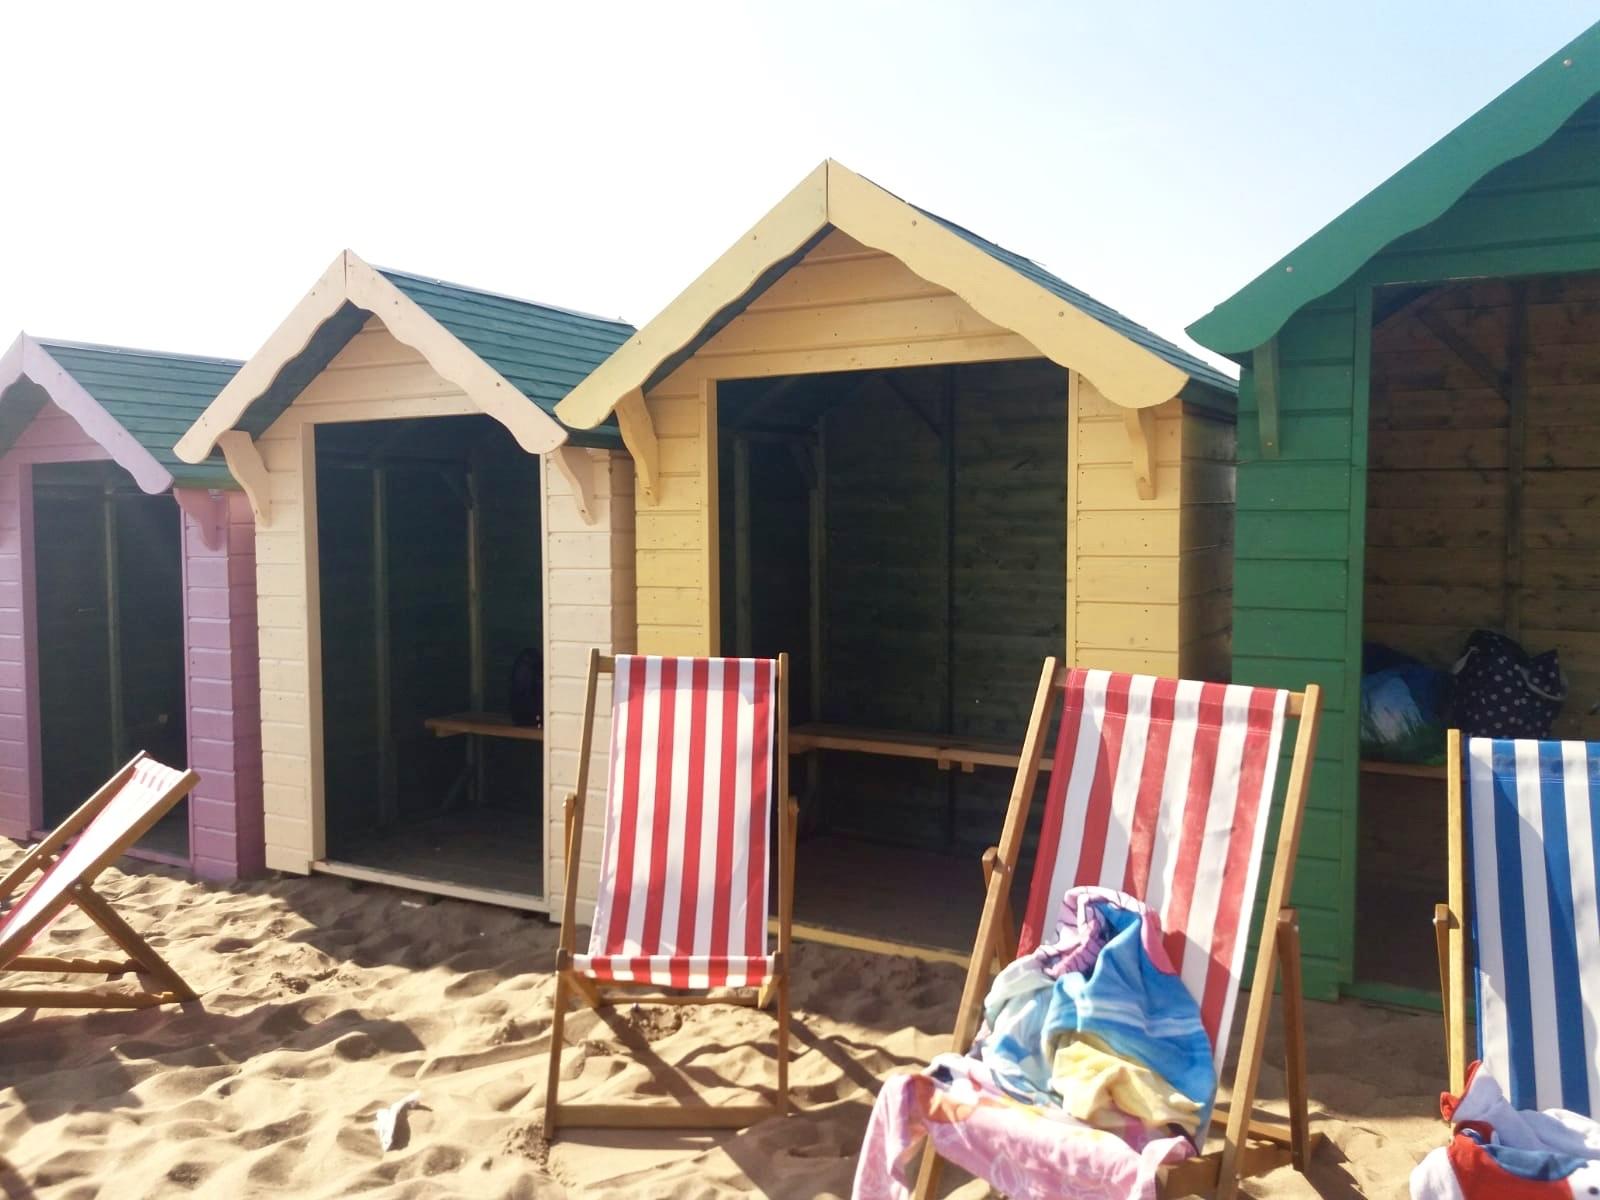 Cardiff Bay Beach 2018